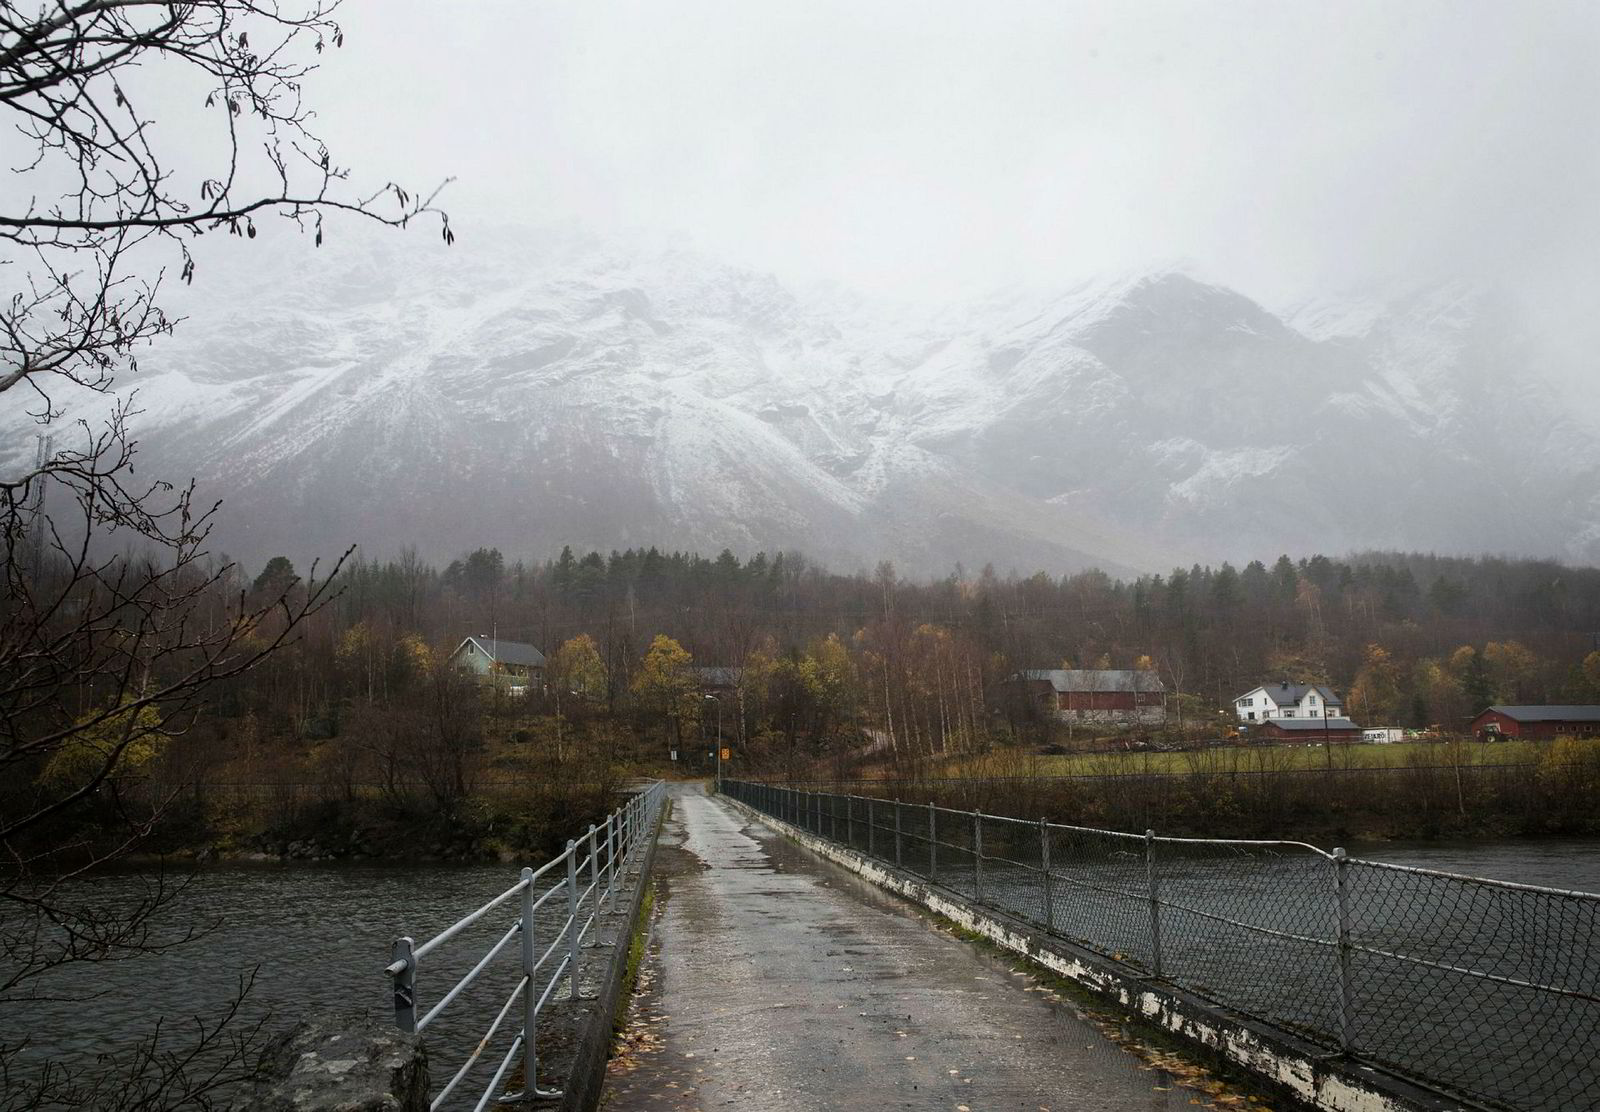 Kunder som benytter en spesiell spotpris, får gratis strøm den dagen «Veslemannen» faller i Rauma.